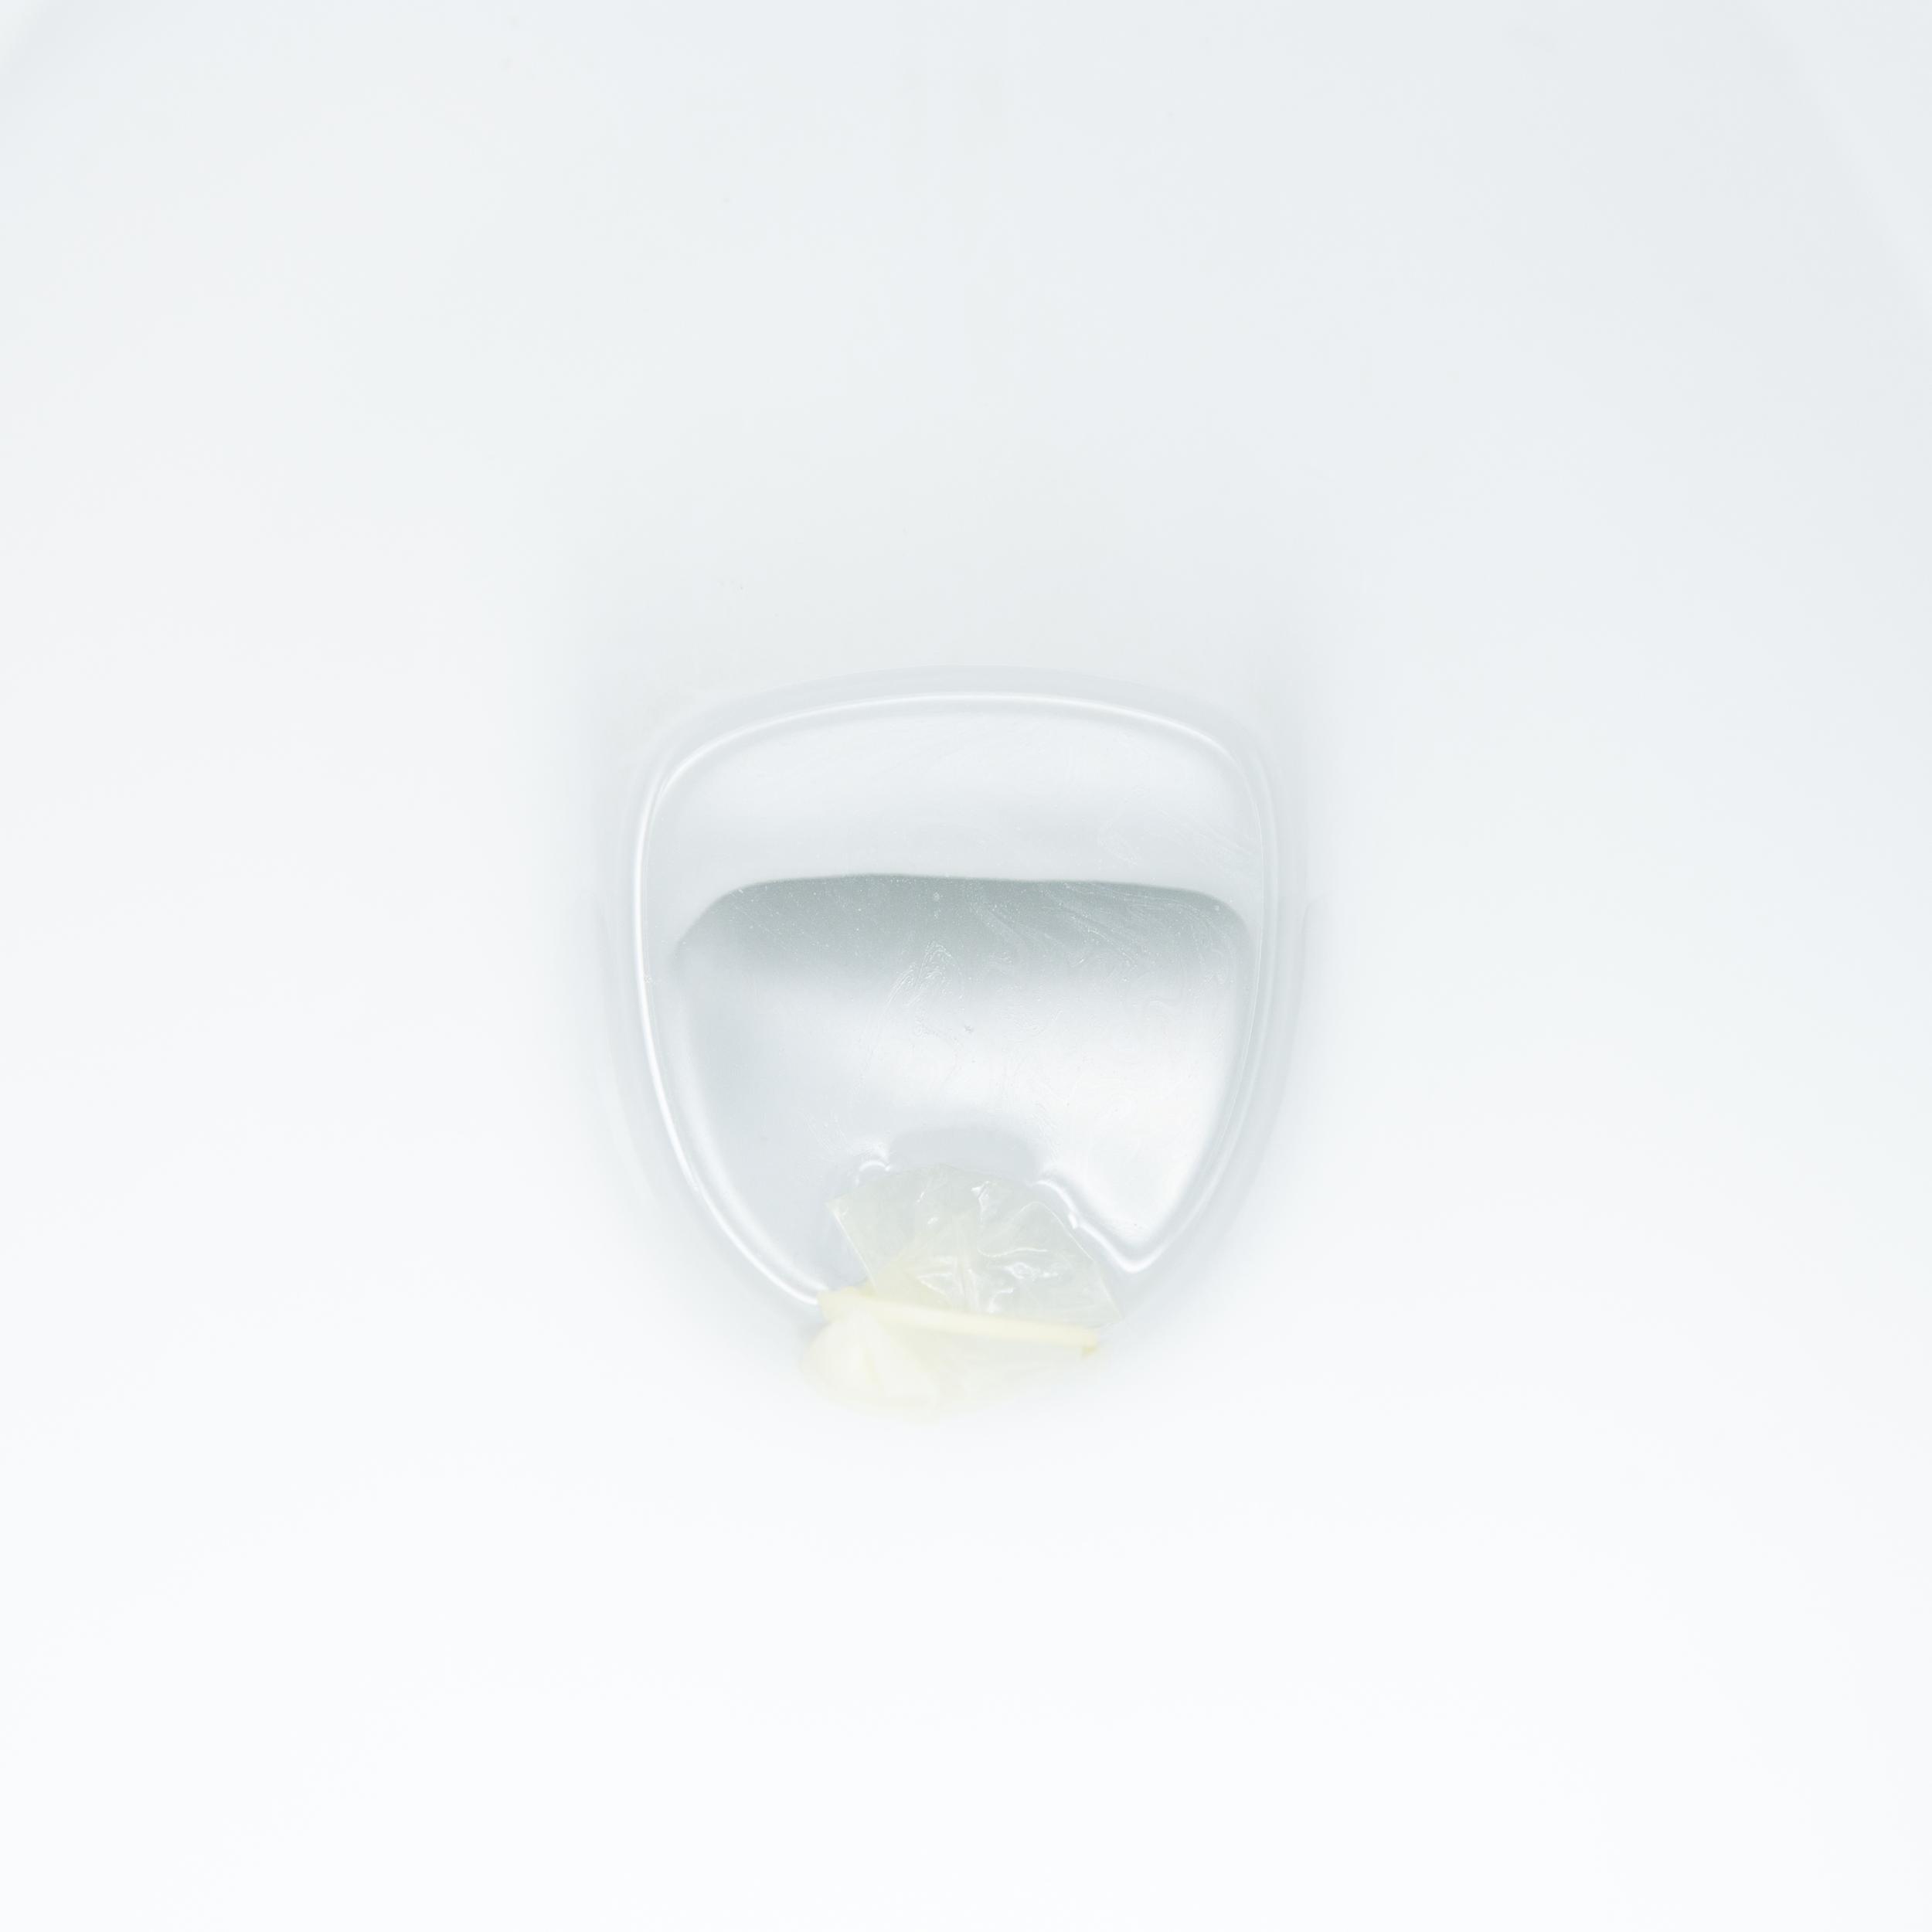 el agujero blanco4-1977_feb2016.jpg